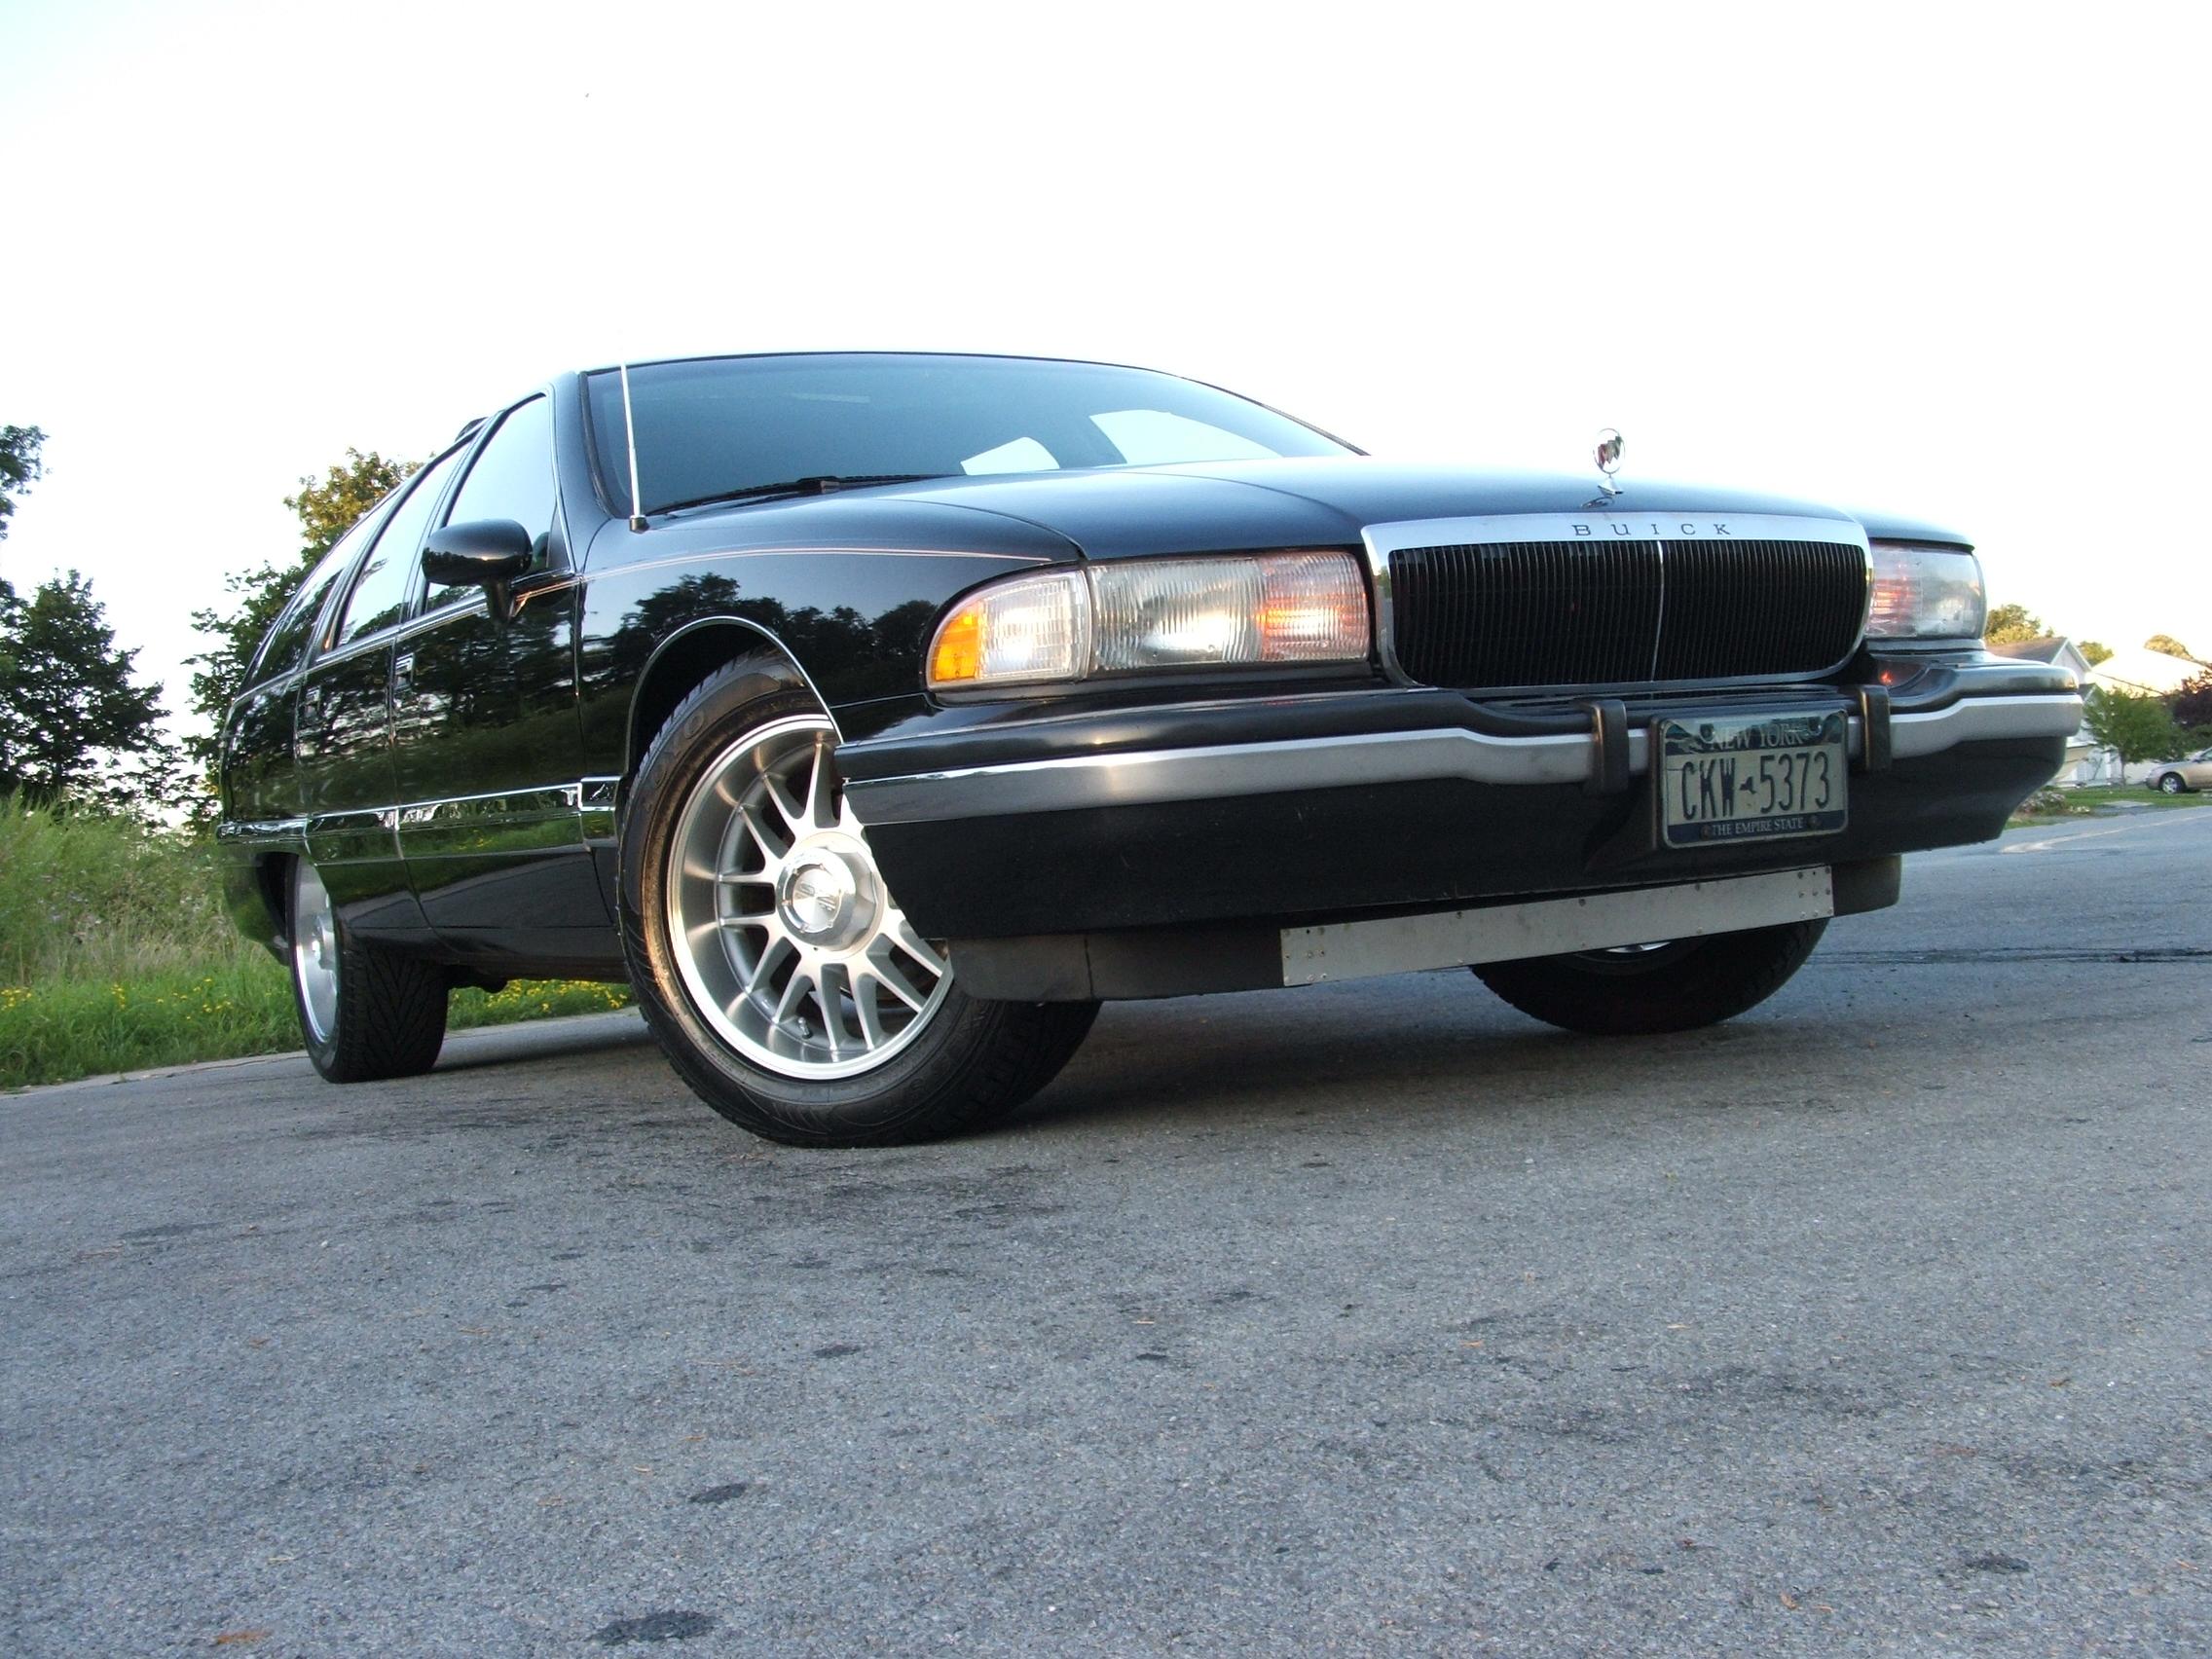 1994 Buick Roadmaster Wagon For Sale - Autoblog